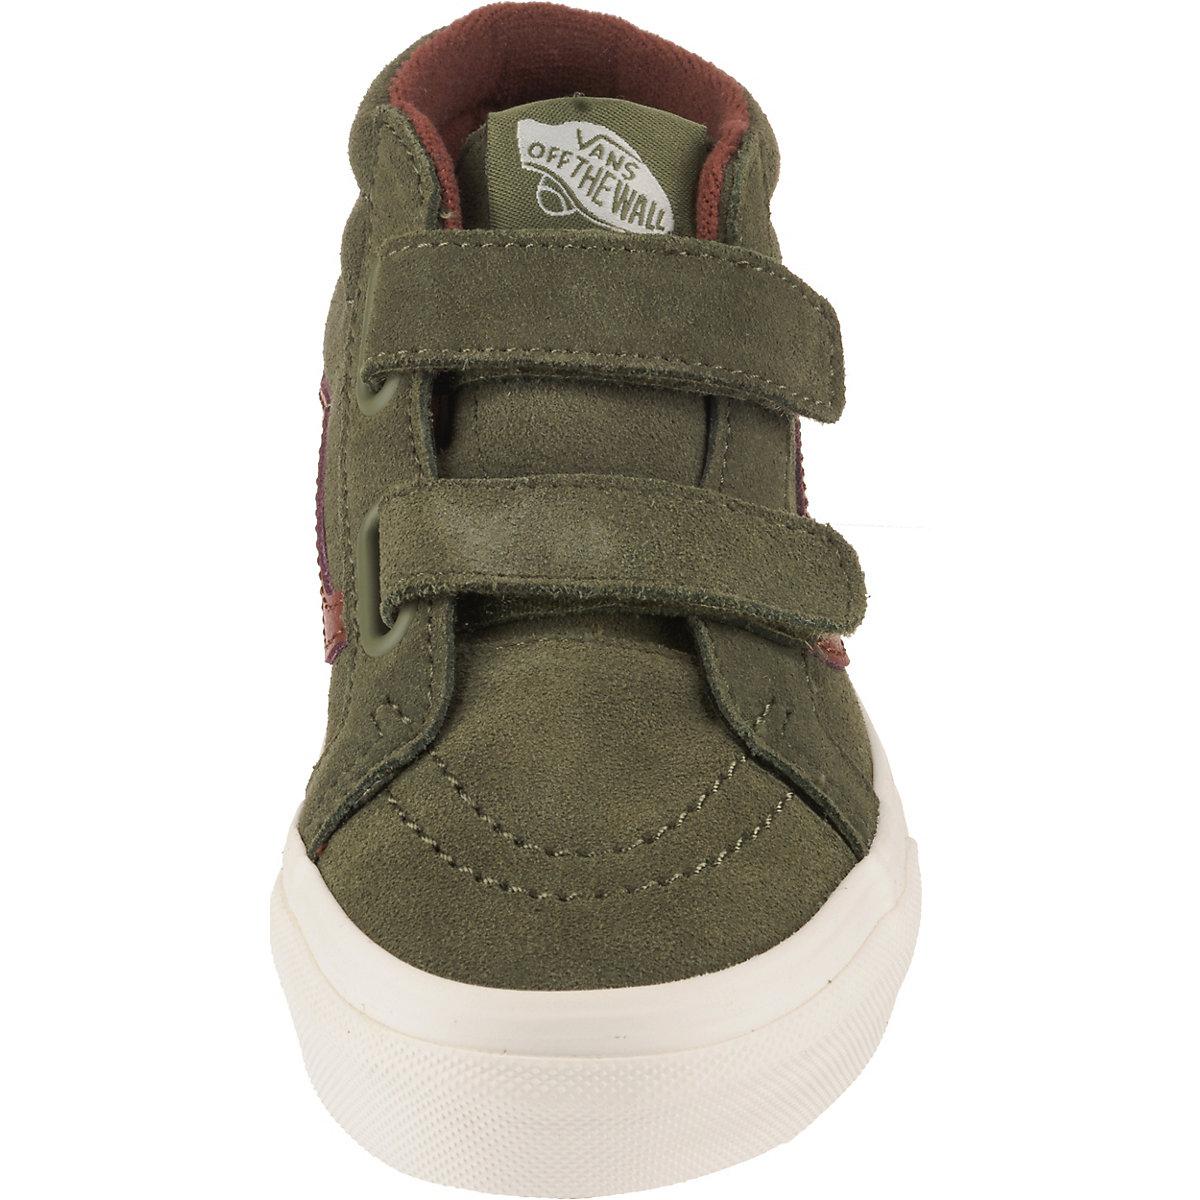 Vans, Sneakers High Comfycush Sk8 Mid Reissure V Für Jungen, Grün